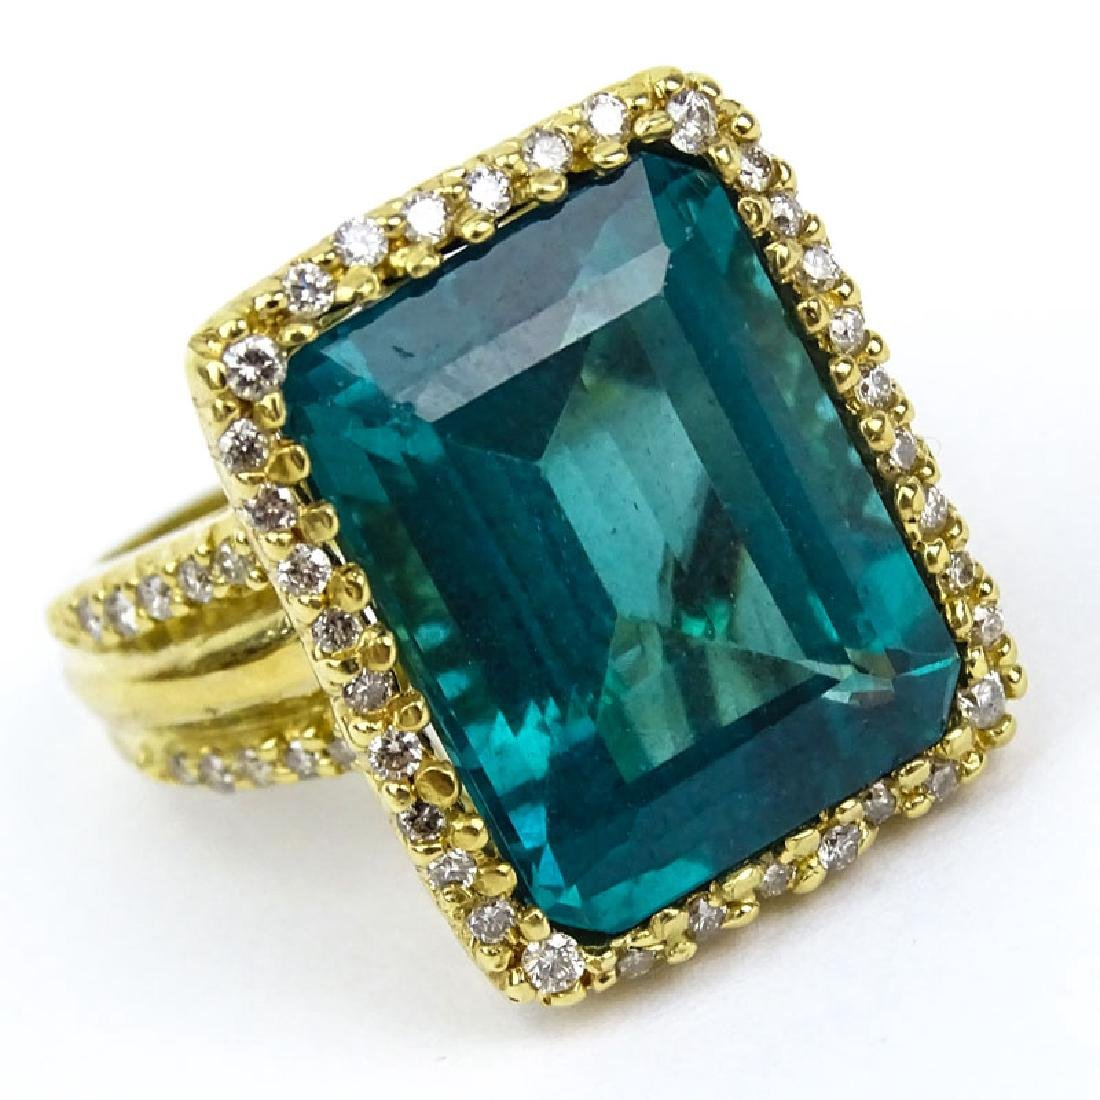 Rare Approx. 18.0 Ct Emerald Cut Brazilian Paraiba Ring